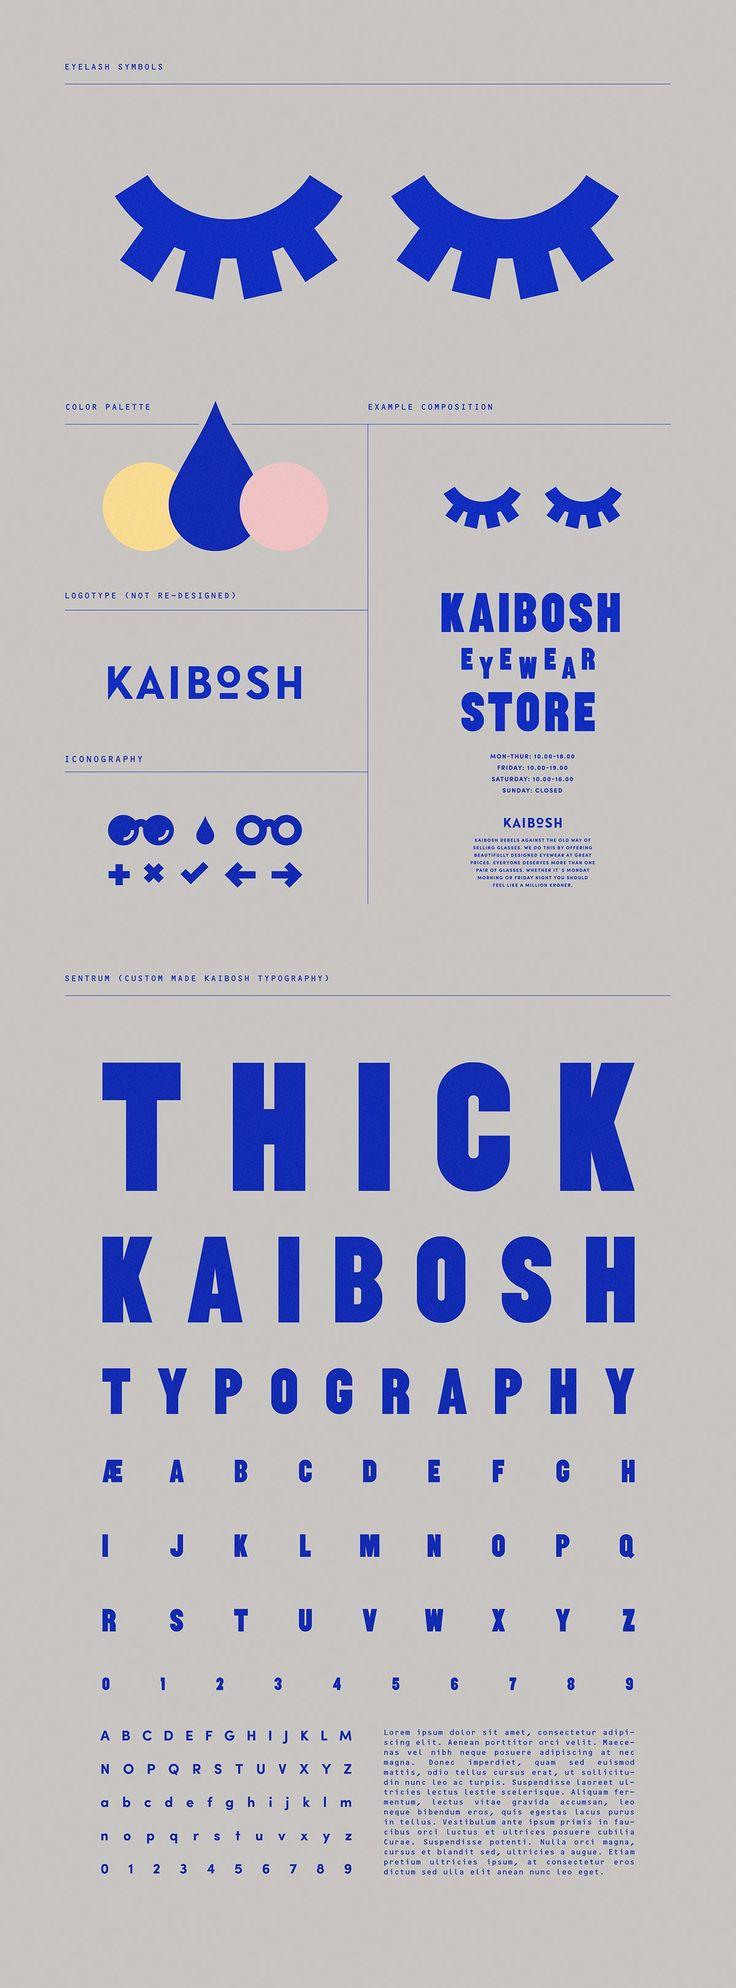 Kaibosh identity